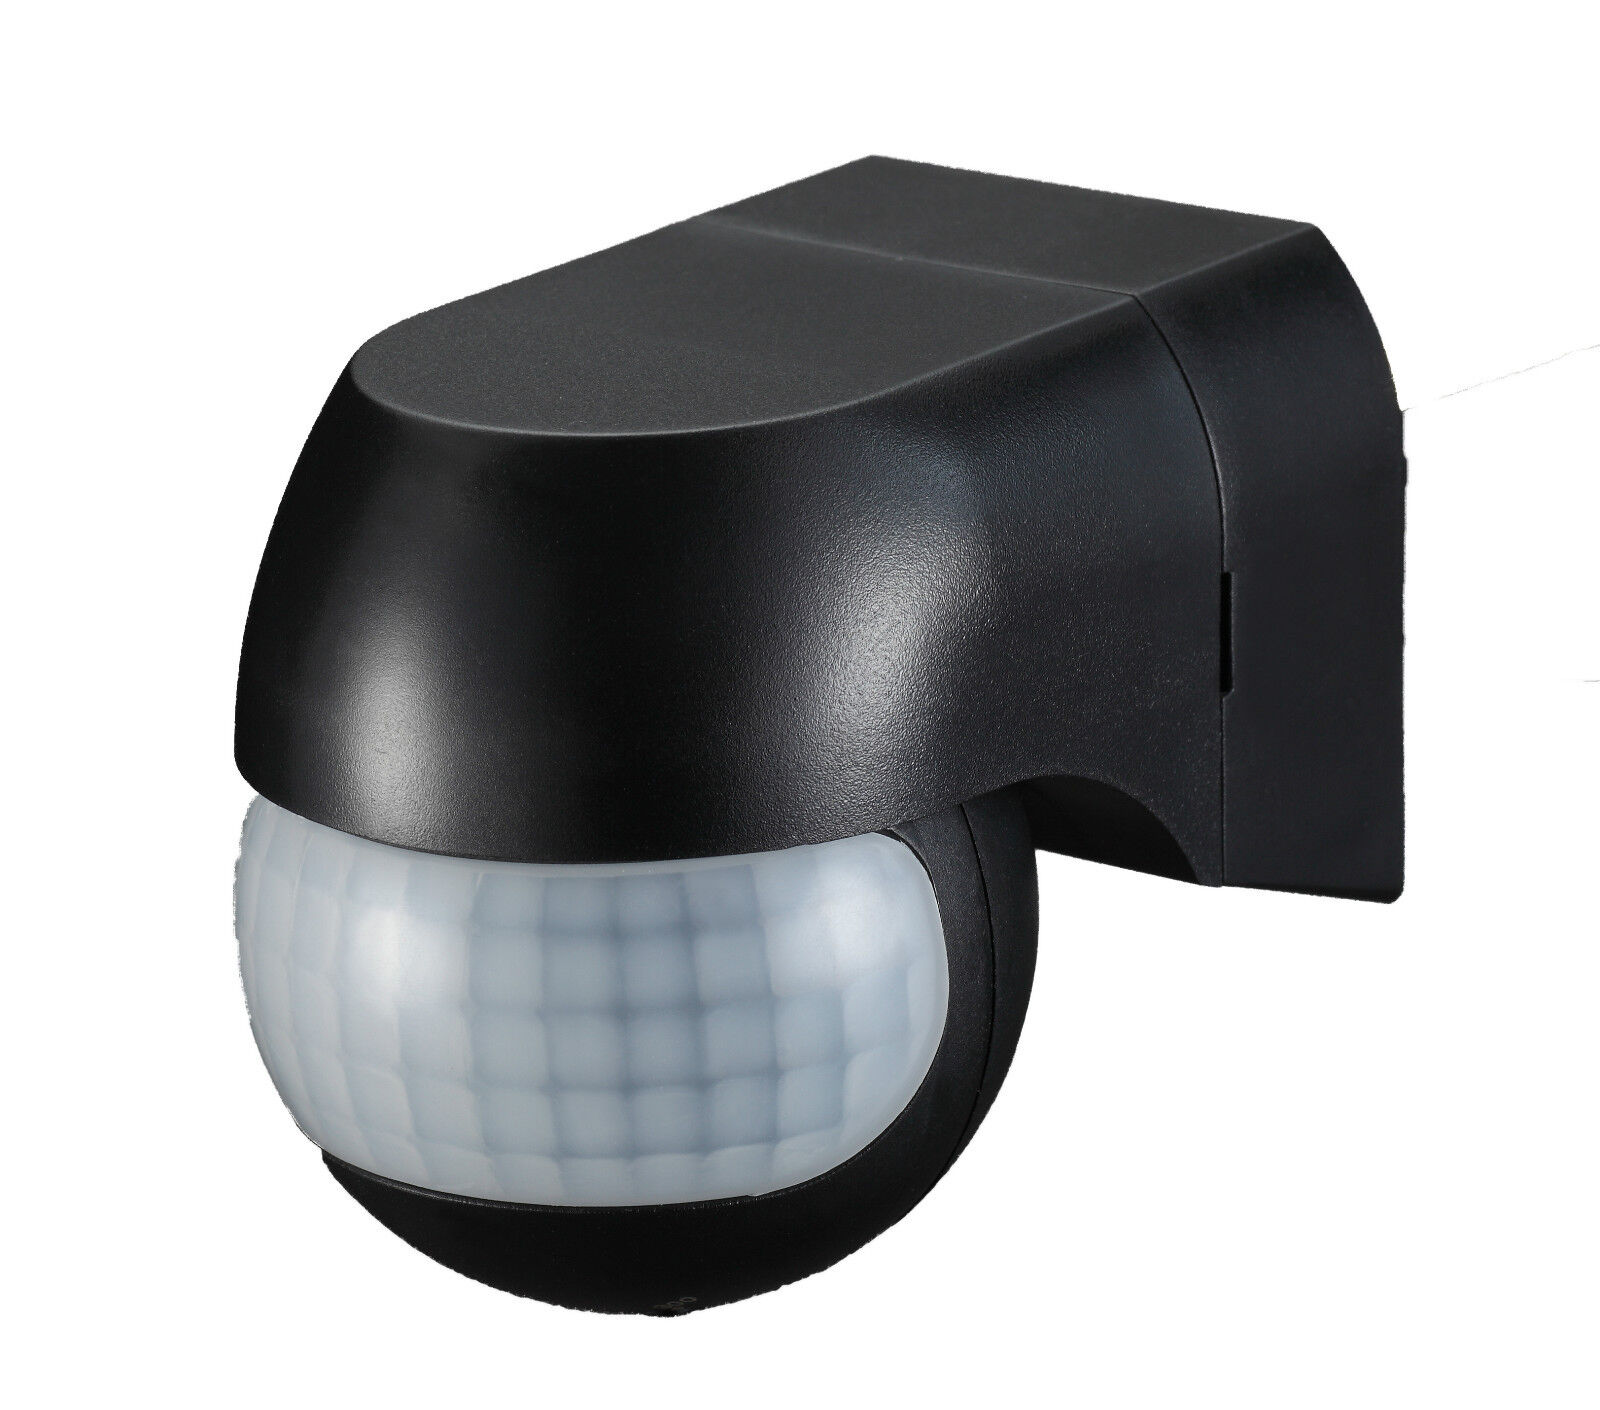 Outdoor Ip44 180 176 Security Lighting Pir Motion Movement